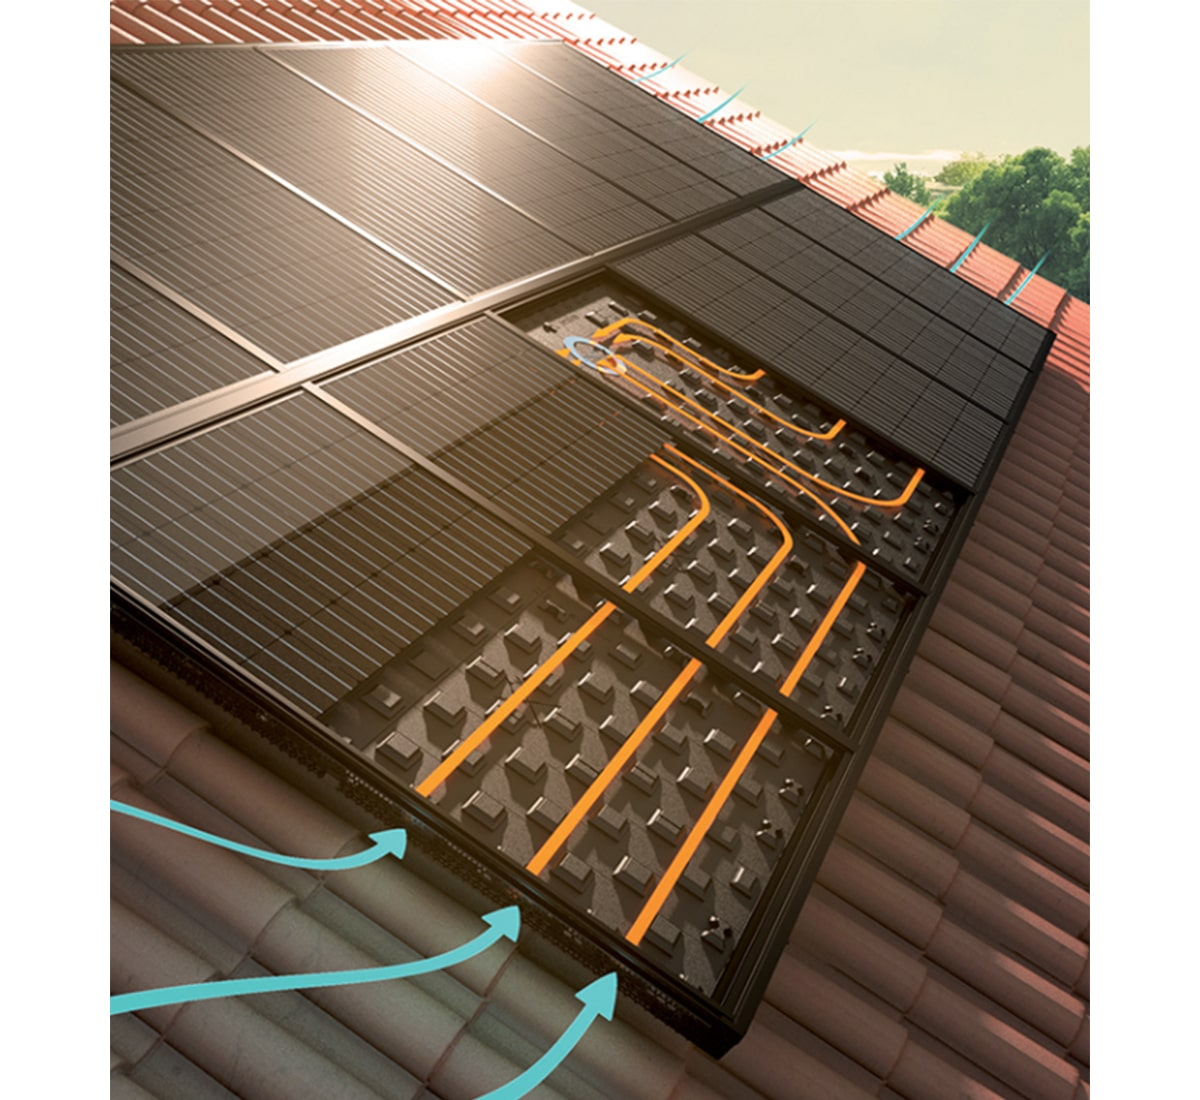 ventillation solaire autonome